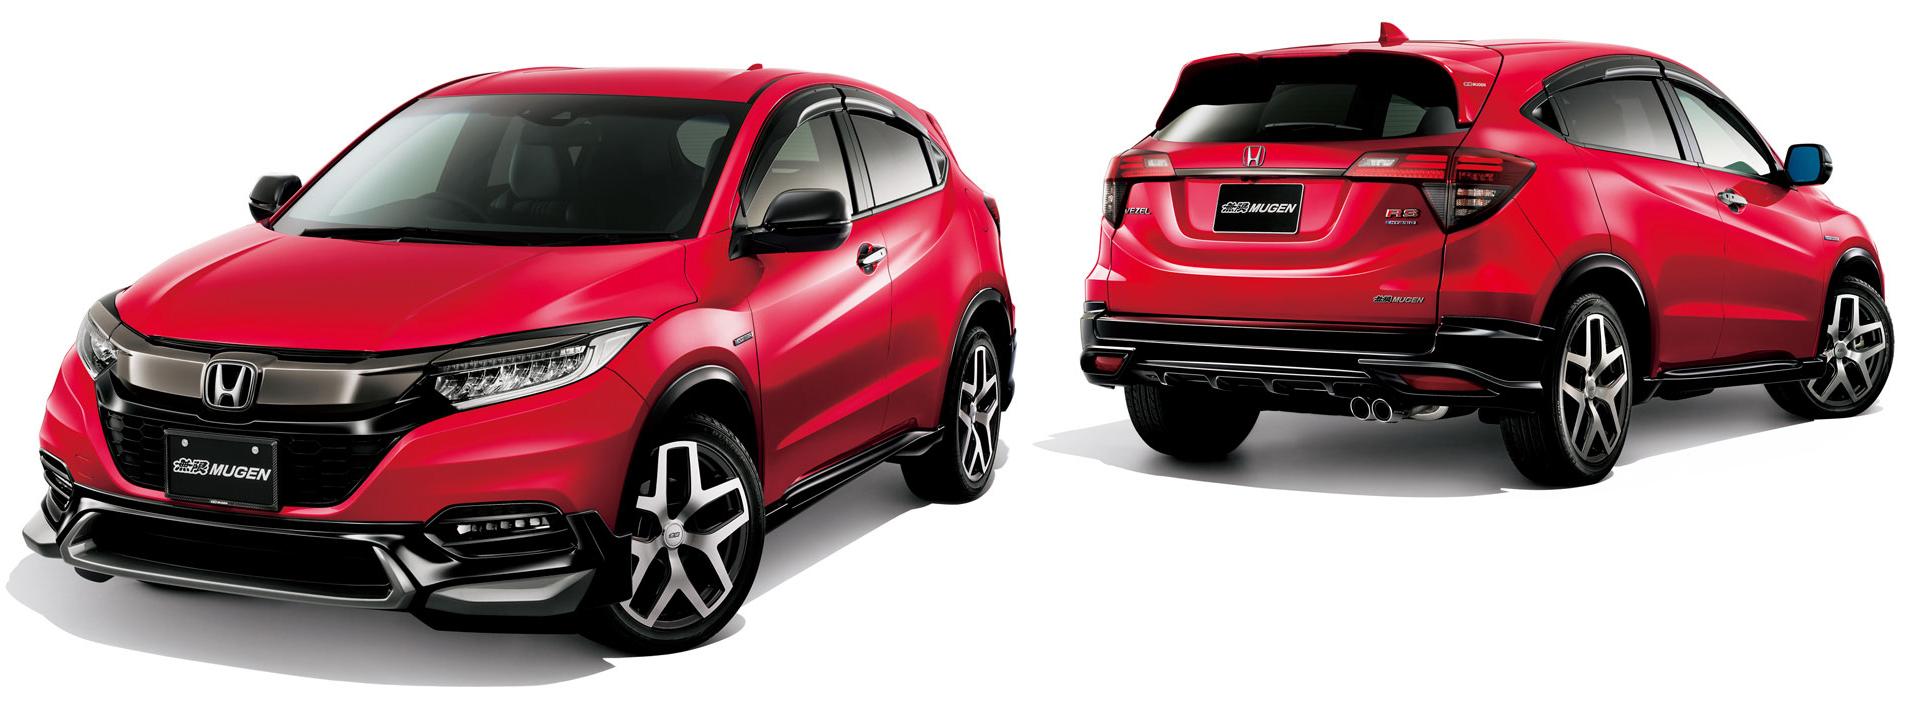 Honda Vezel 2018 >> 2018 Honda HR-V facelift gets Mugen and Modulo kits Paul Tan - Image 780157